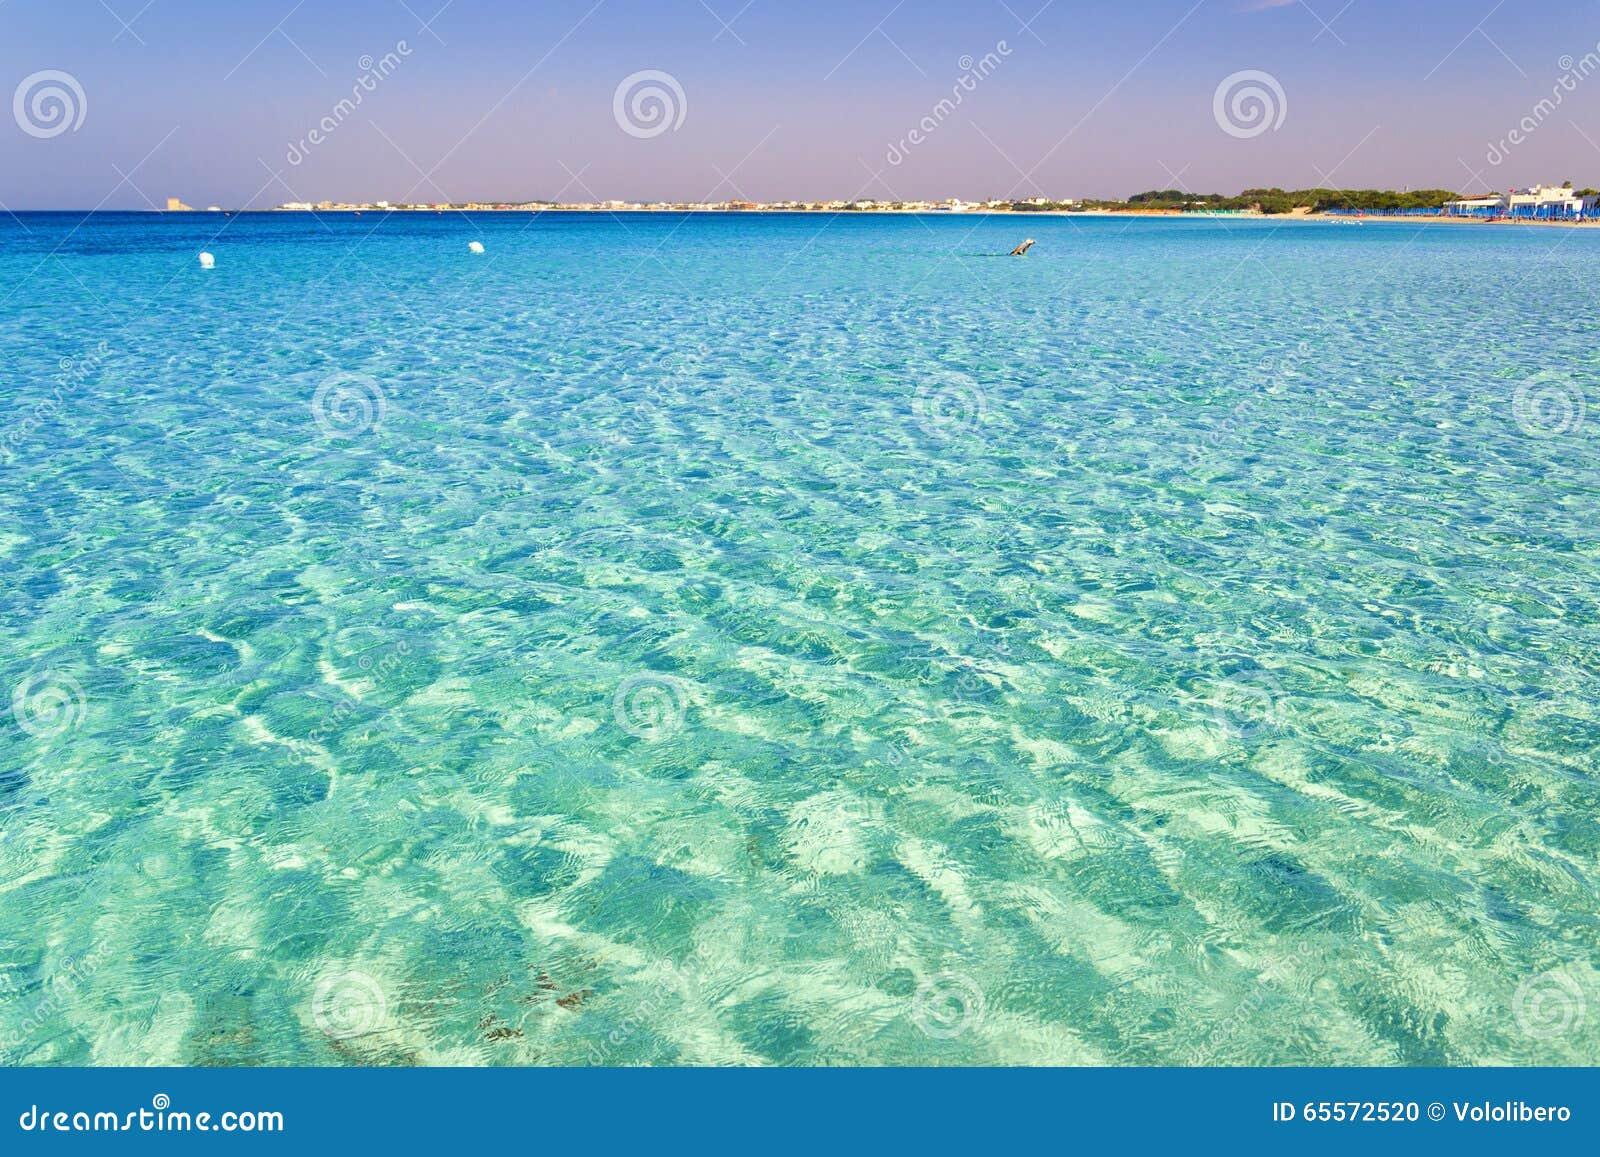 De mooiste zandige stranden van Apulia: Porto Cesareo marine, Salento coastITALY (Lecce)